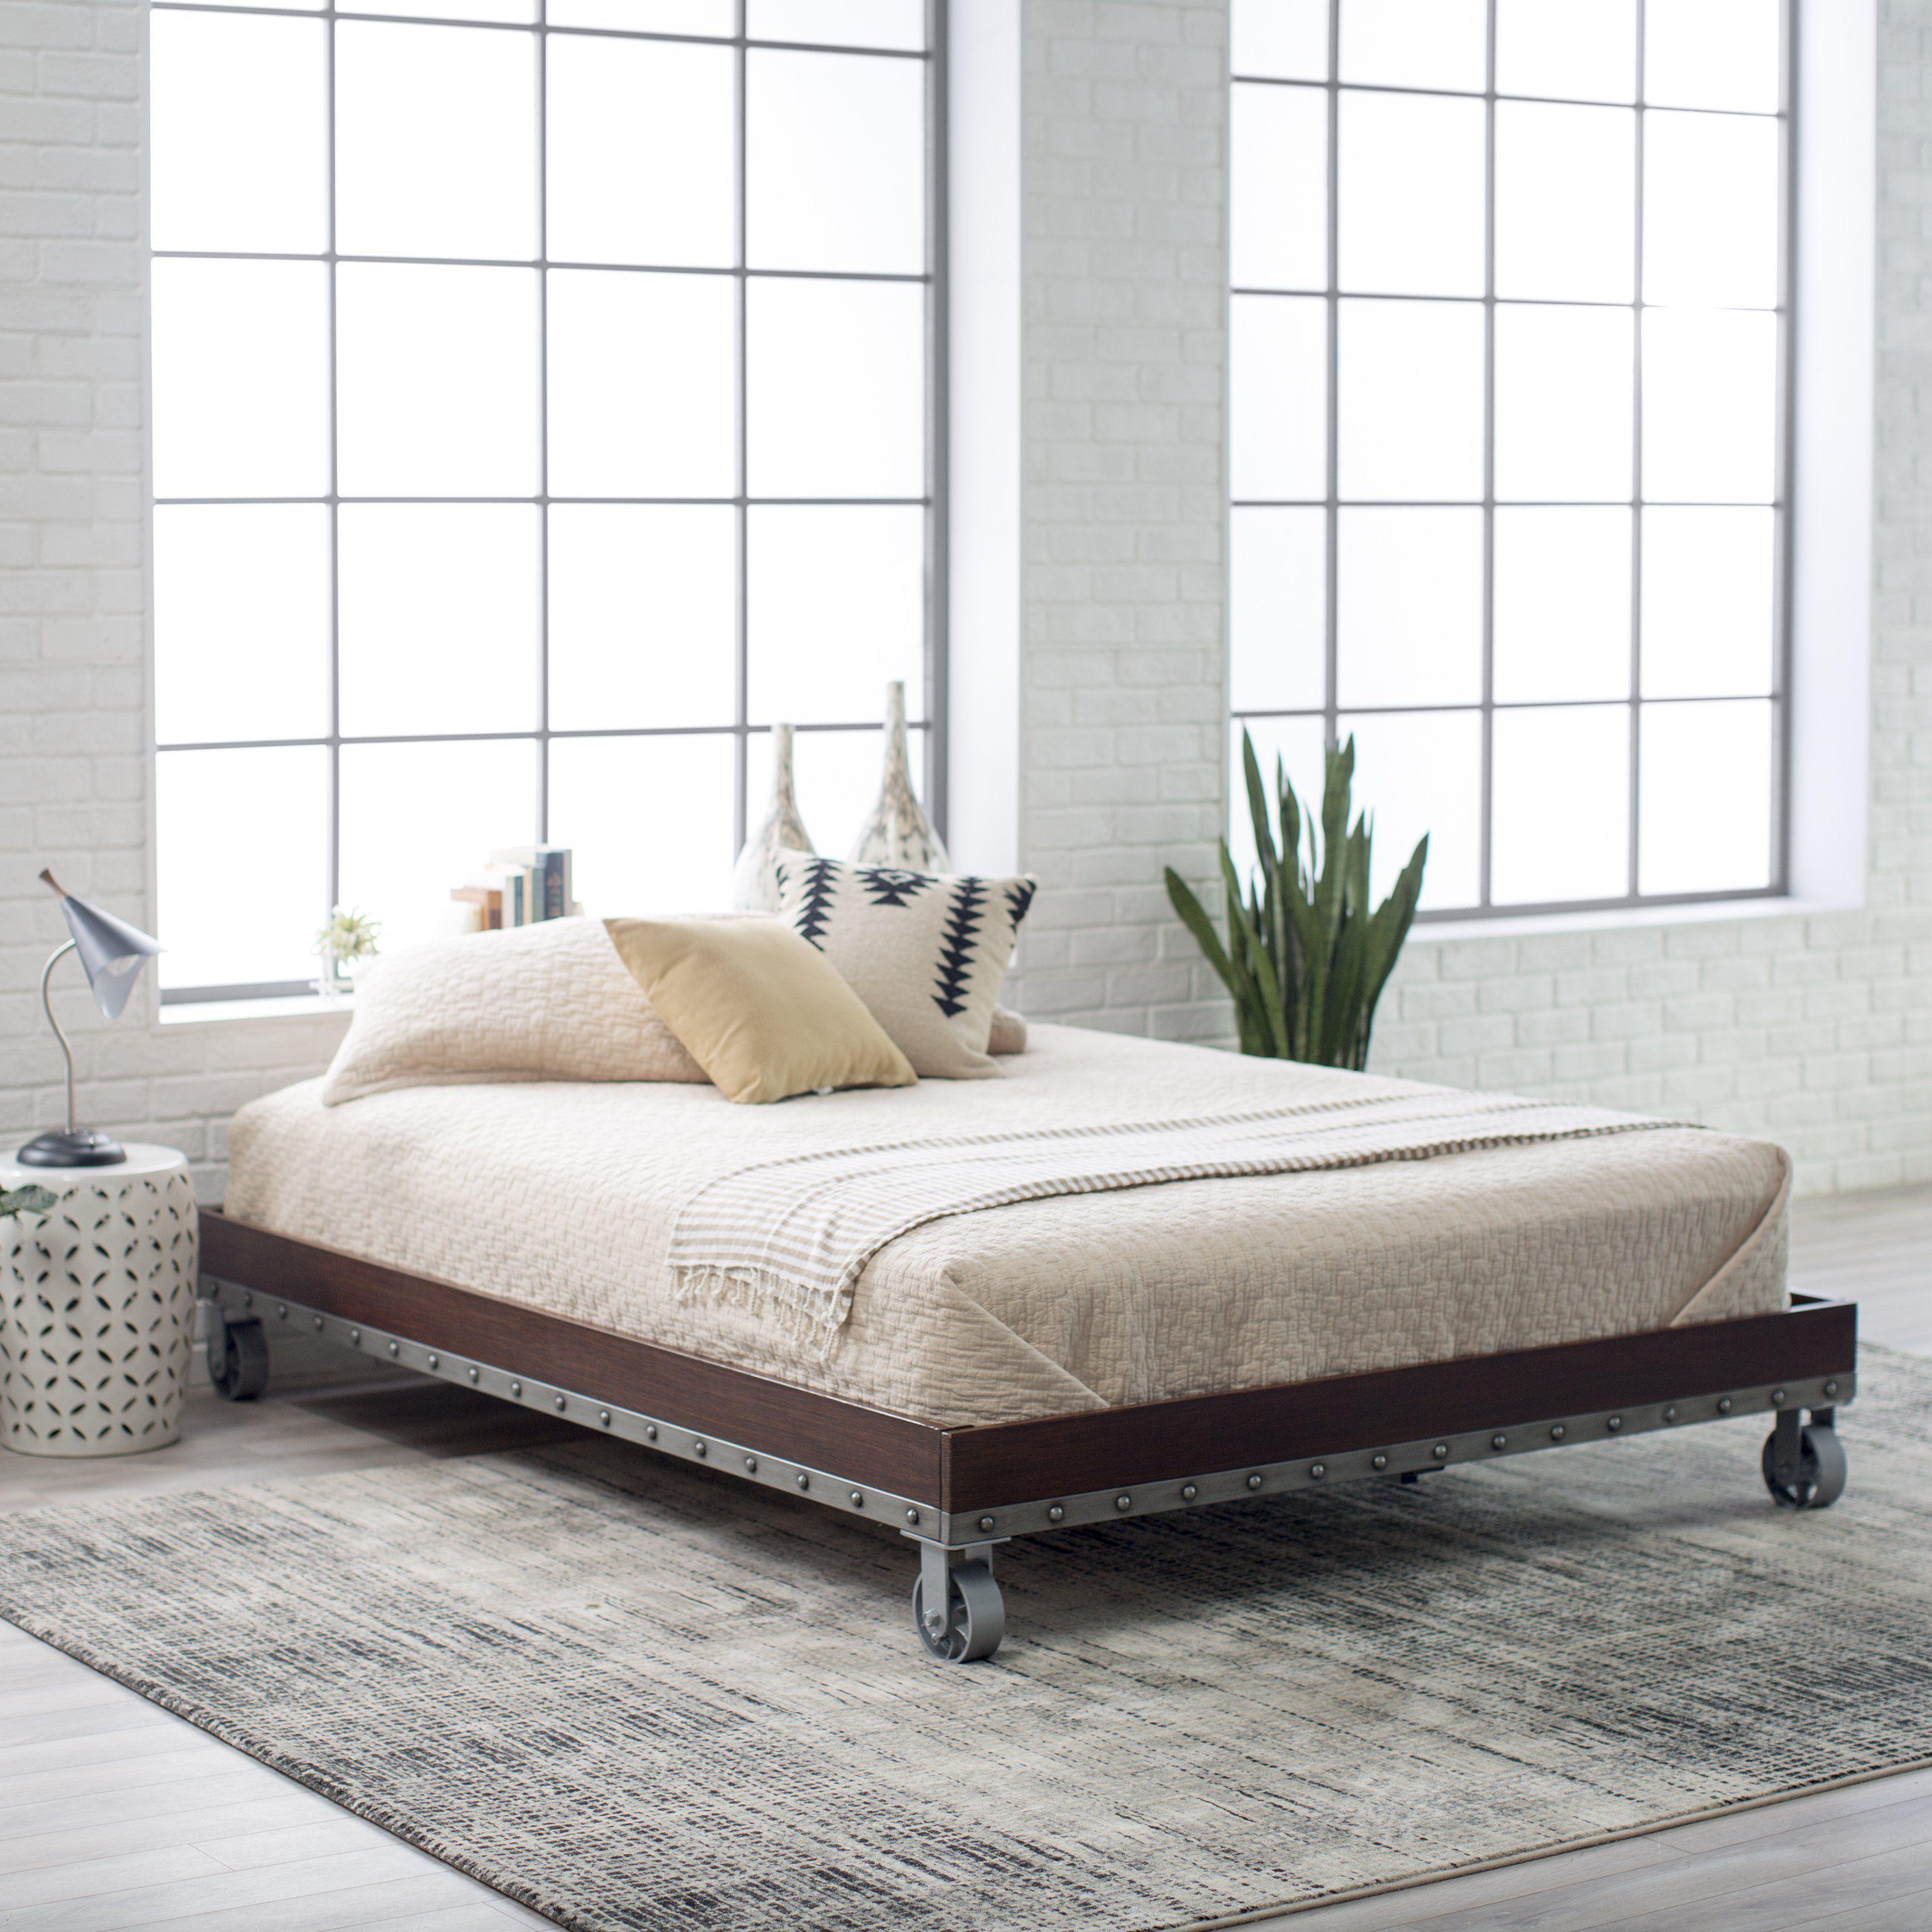 Belham Living Merced Platform Cart Bed Enhance Your Bedroom With The Rustic Beauty Of